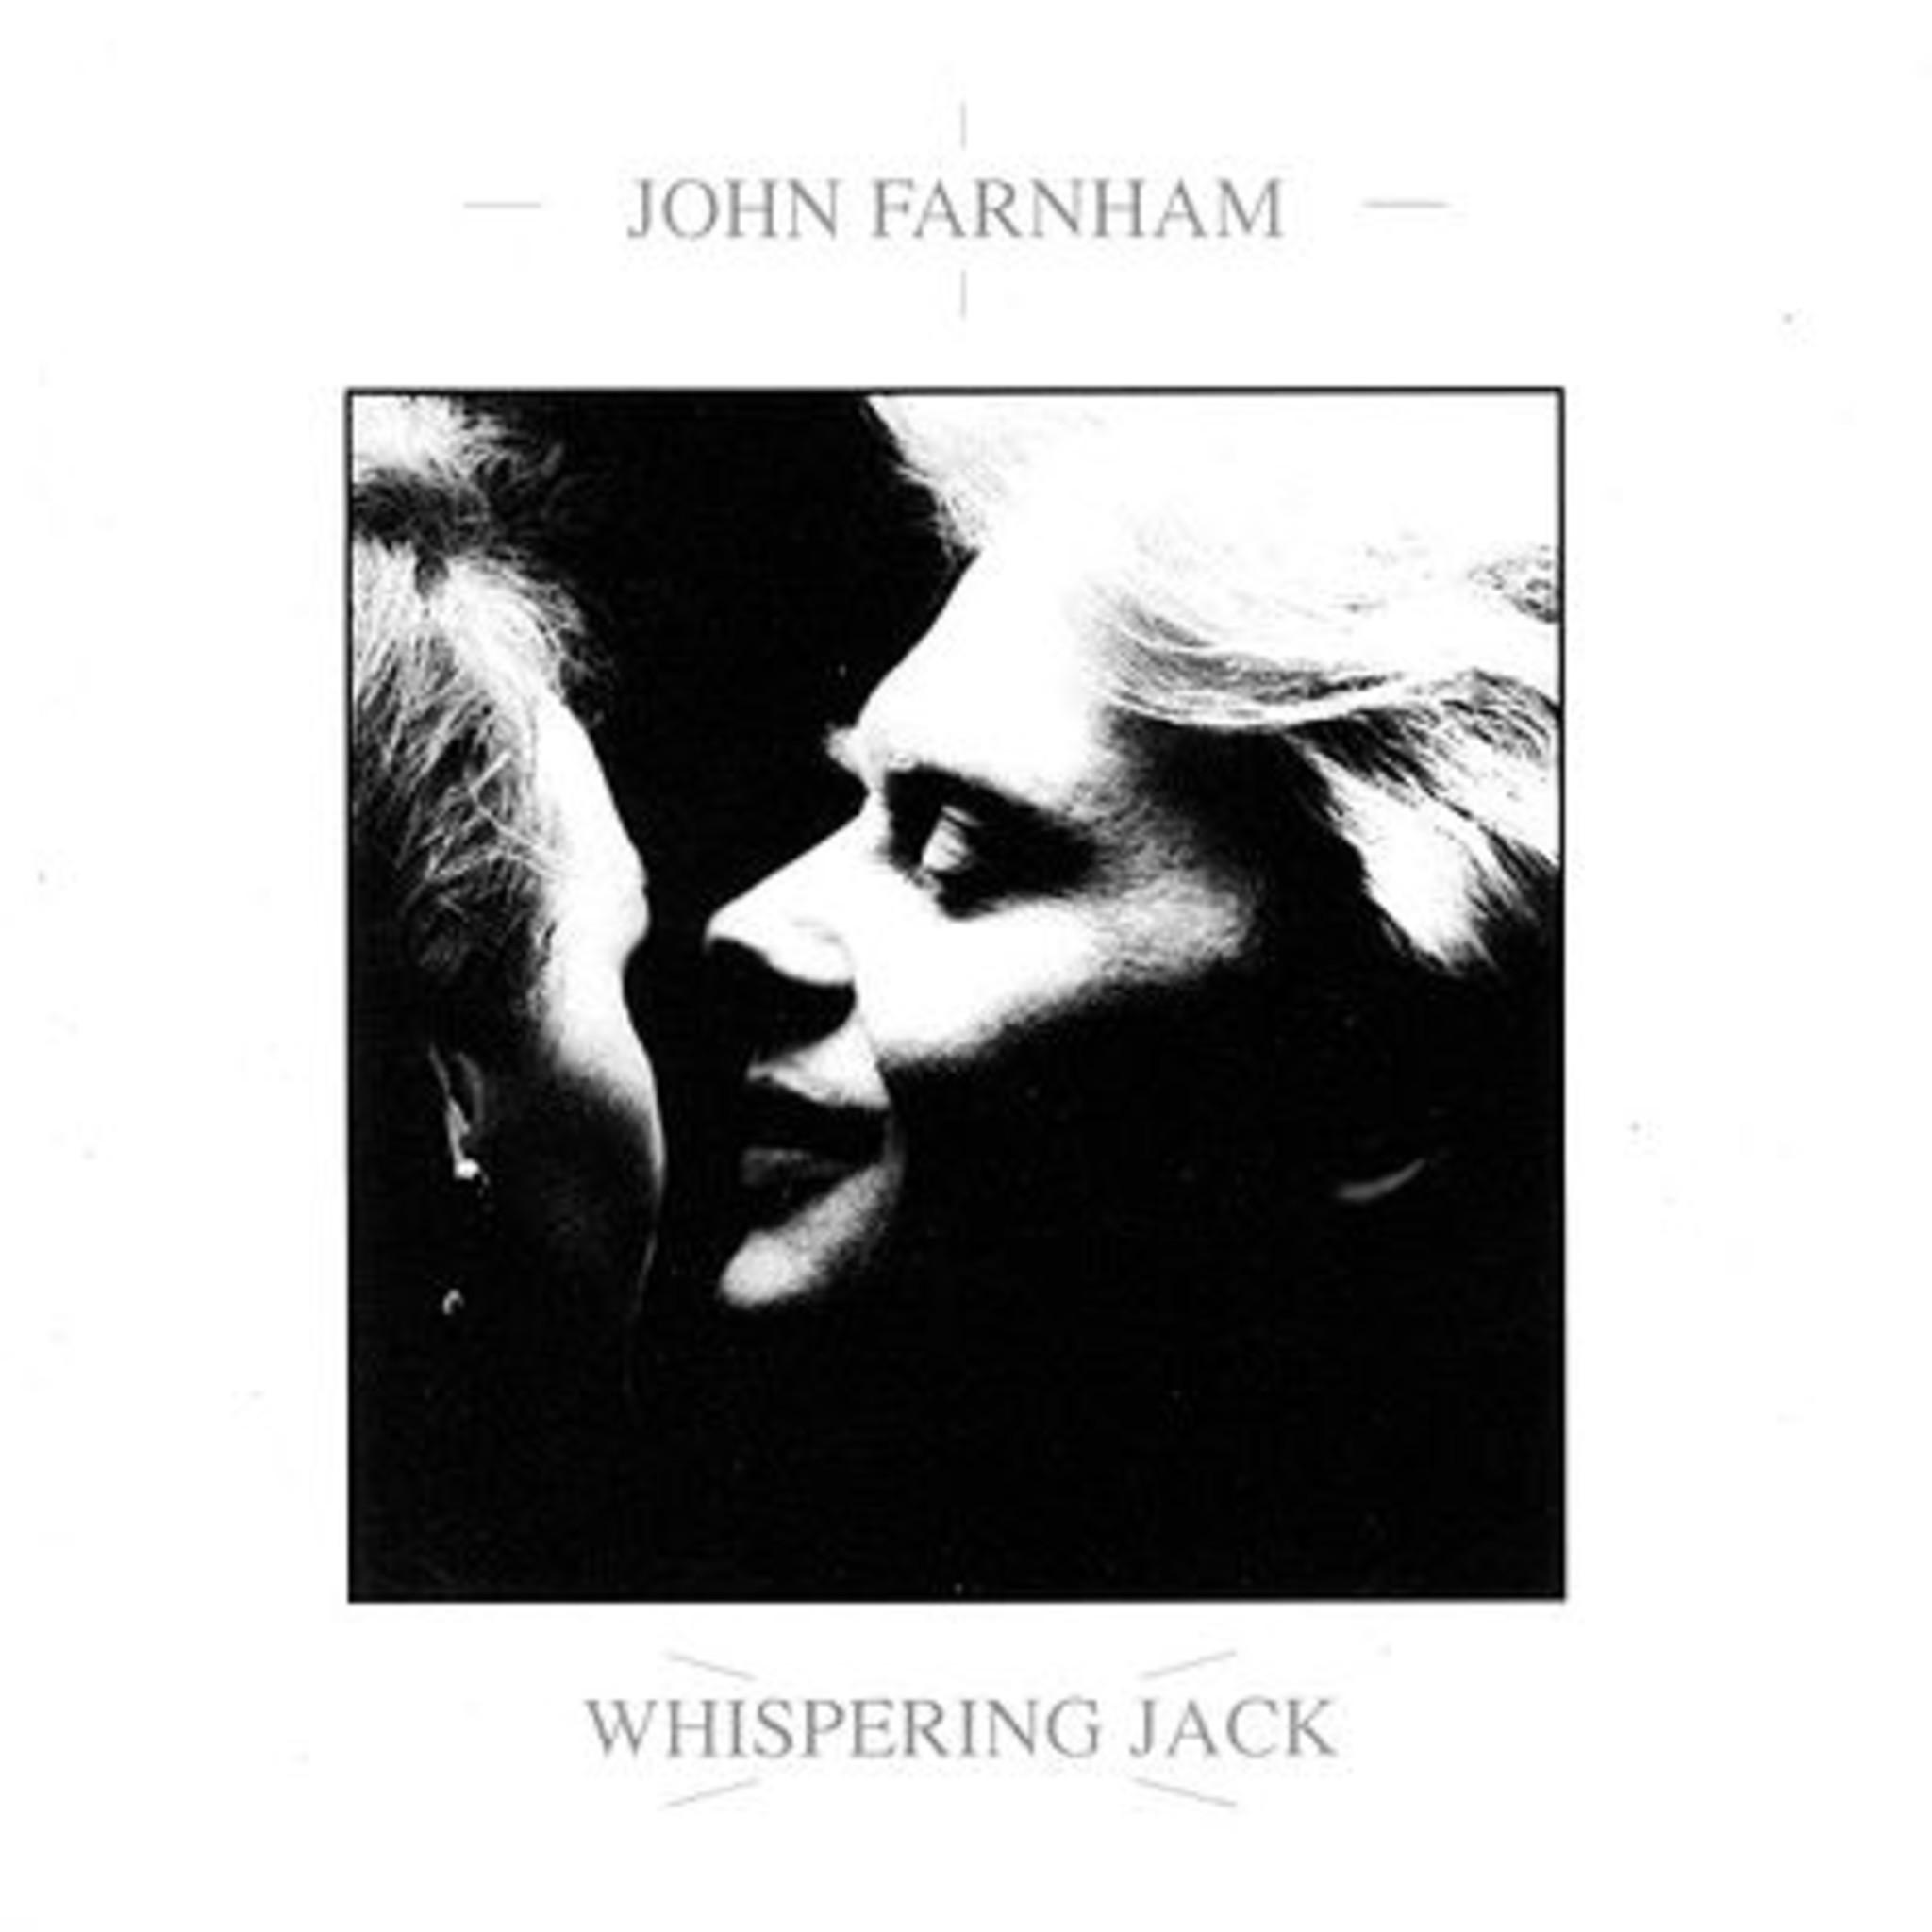 RadioWest - Glenn Wheatley on 30 years since John Farnham's Whispering Jack (Part 1)